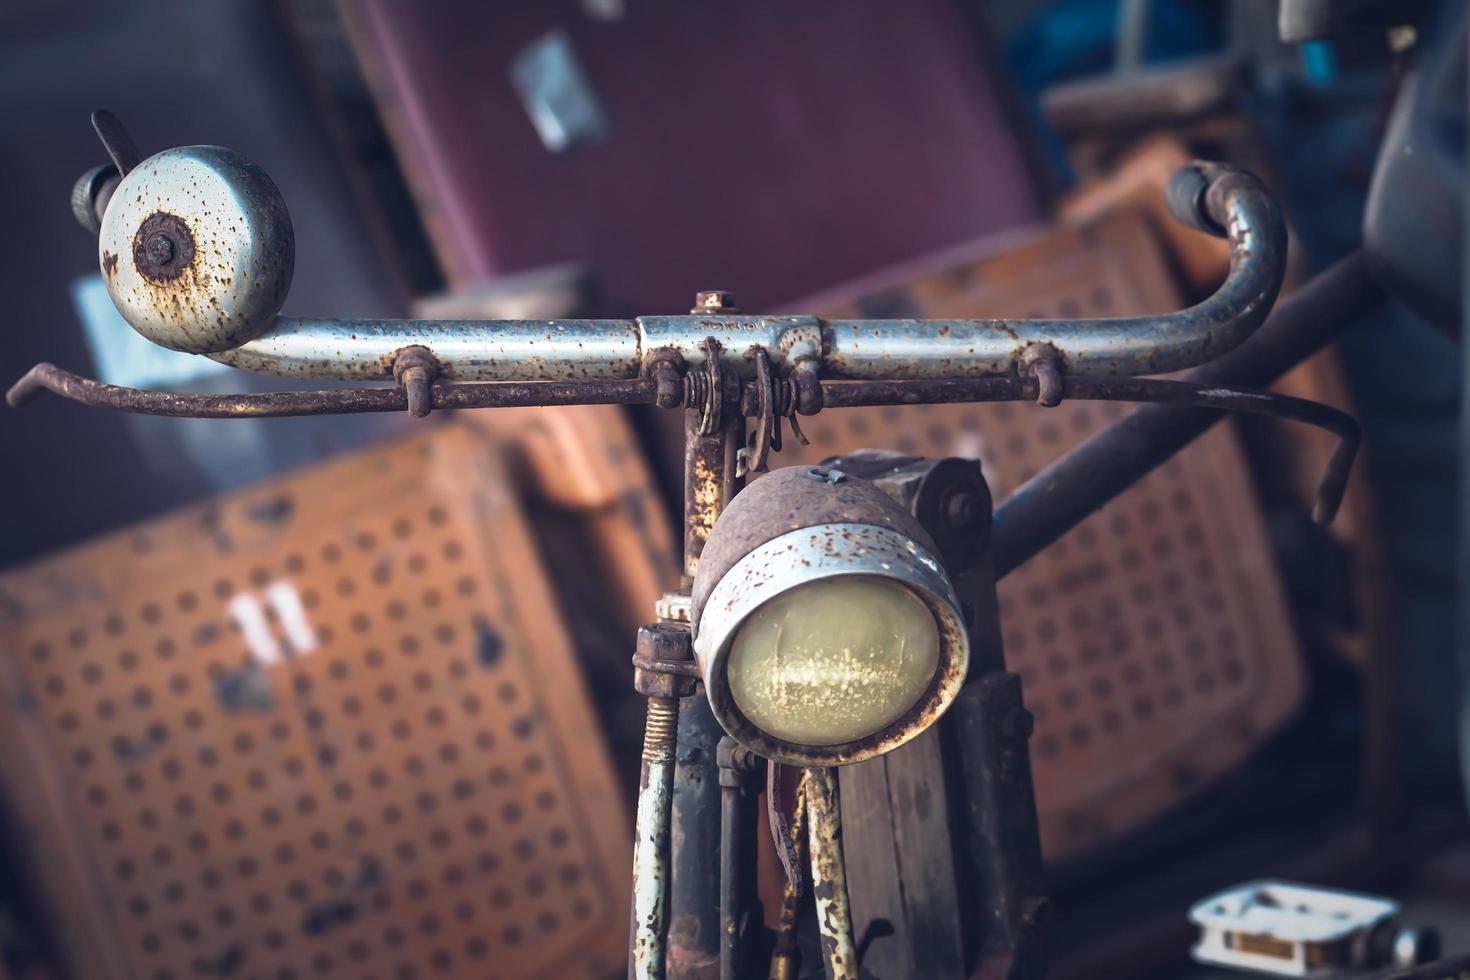 Manillar de bicicleta oxidado viejo retro foto